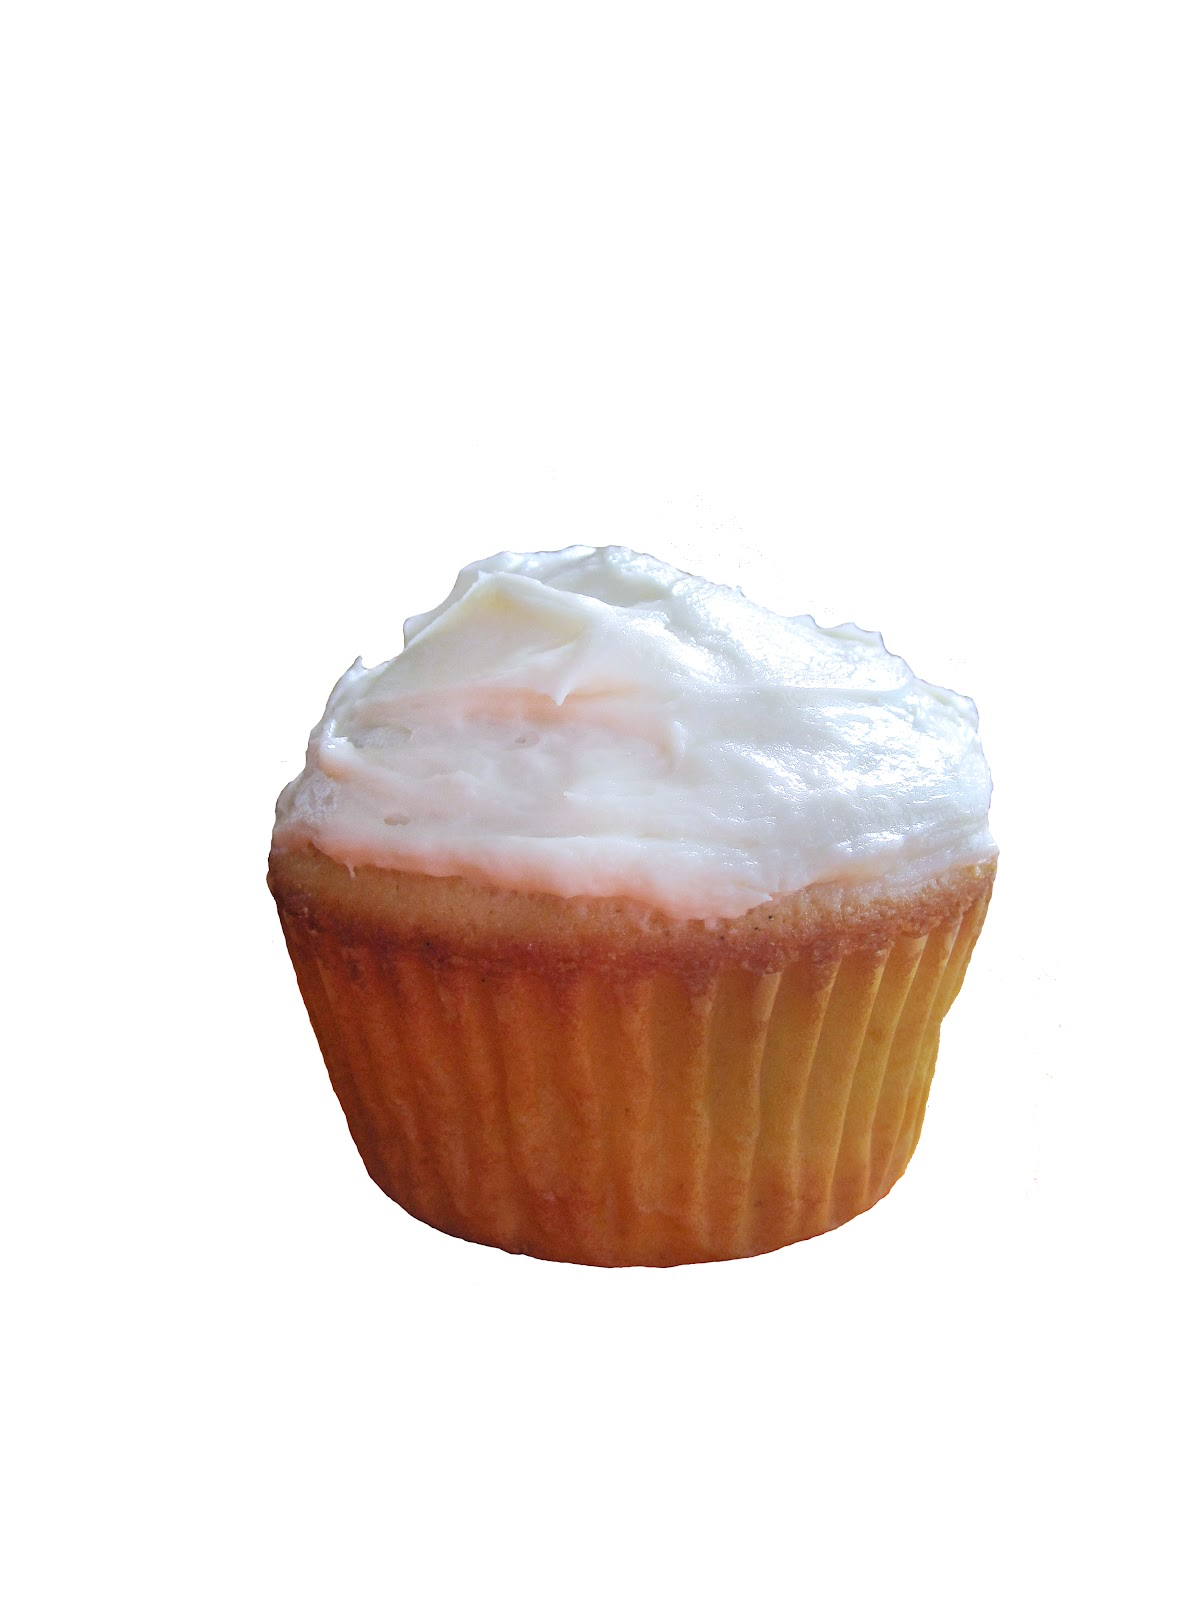 ultimate vanilla cupcake the ultimate vanilla cupcake has been given ...